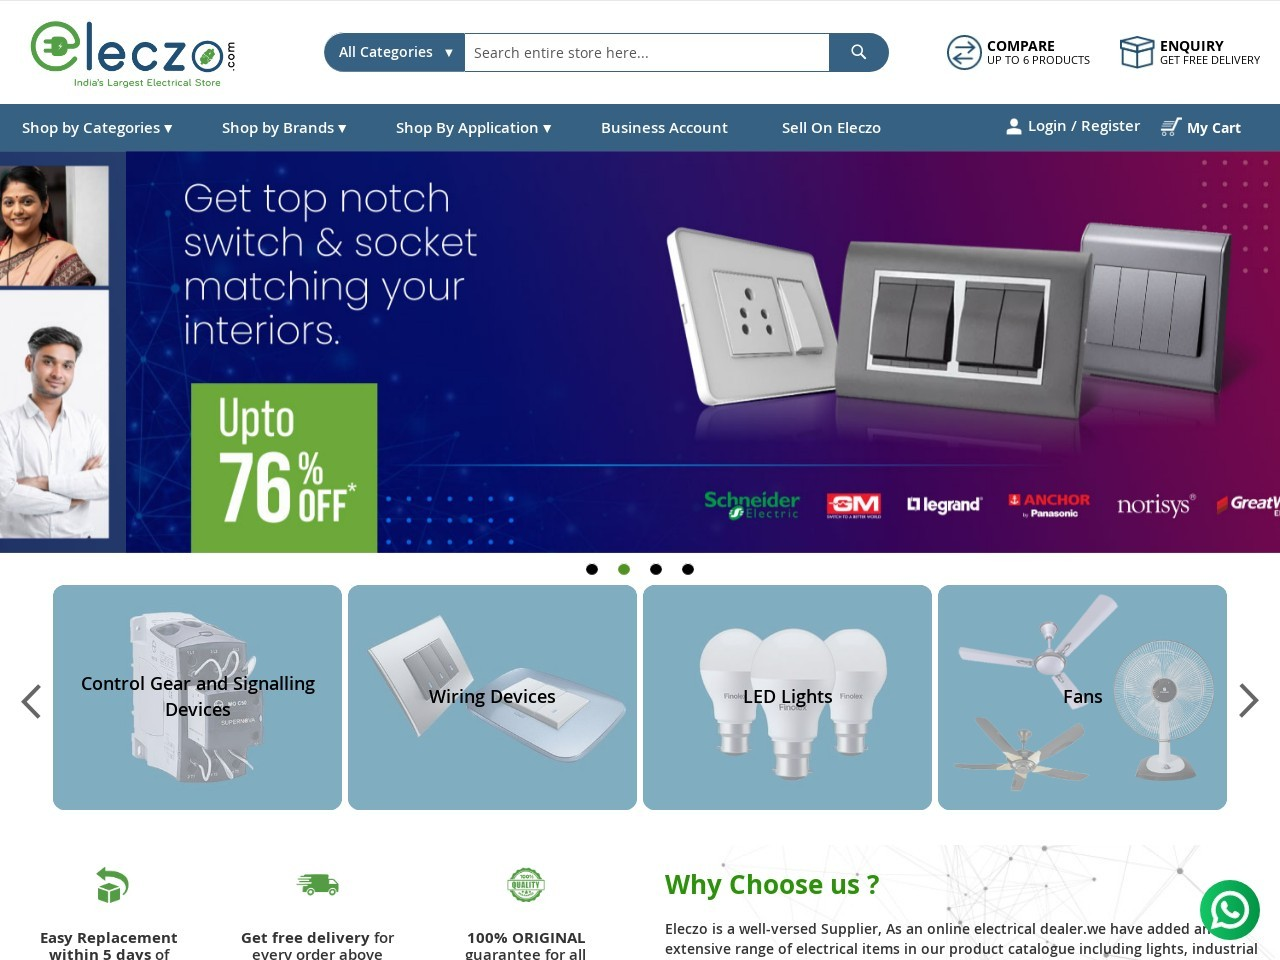 Buy Siemens 5SL64507RC 4 Pole 50 Amp MCB at Online |Eleczo.com